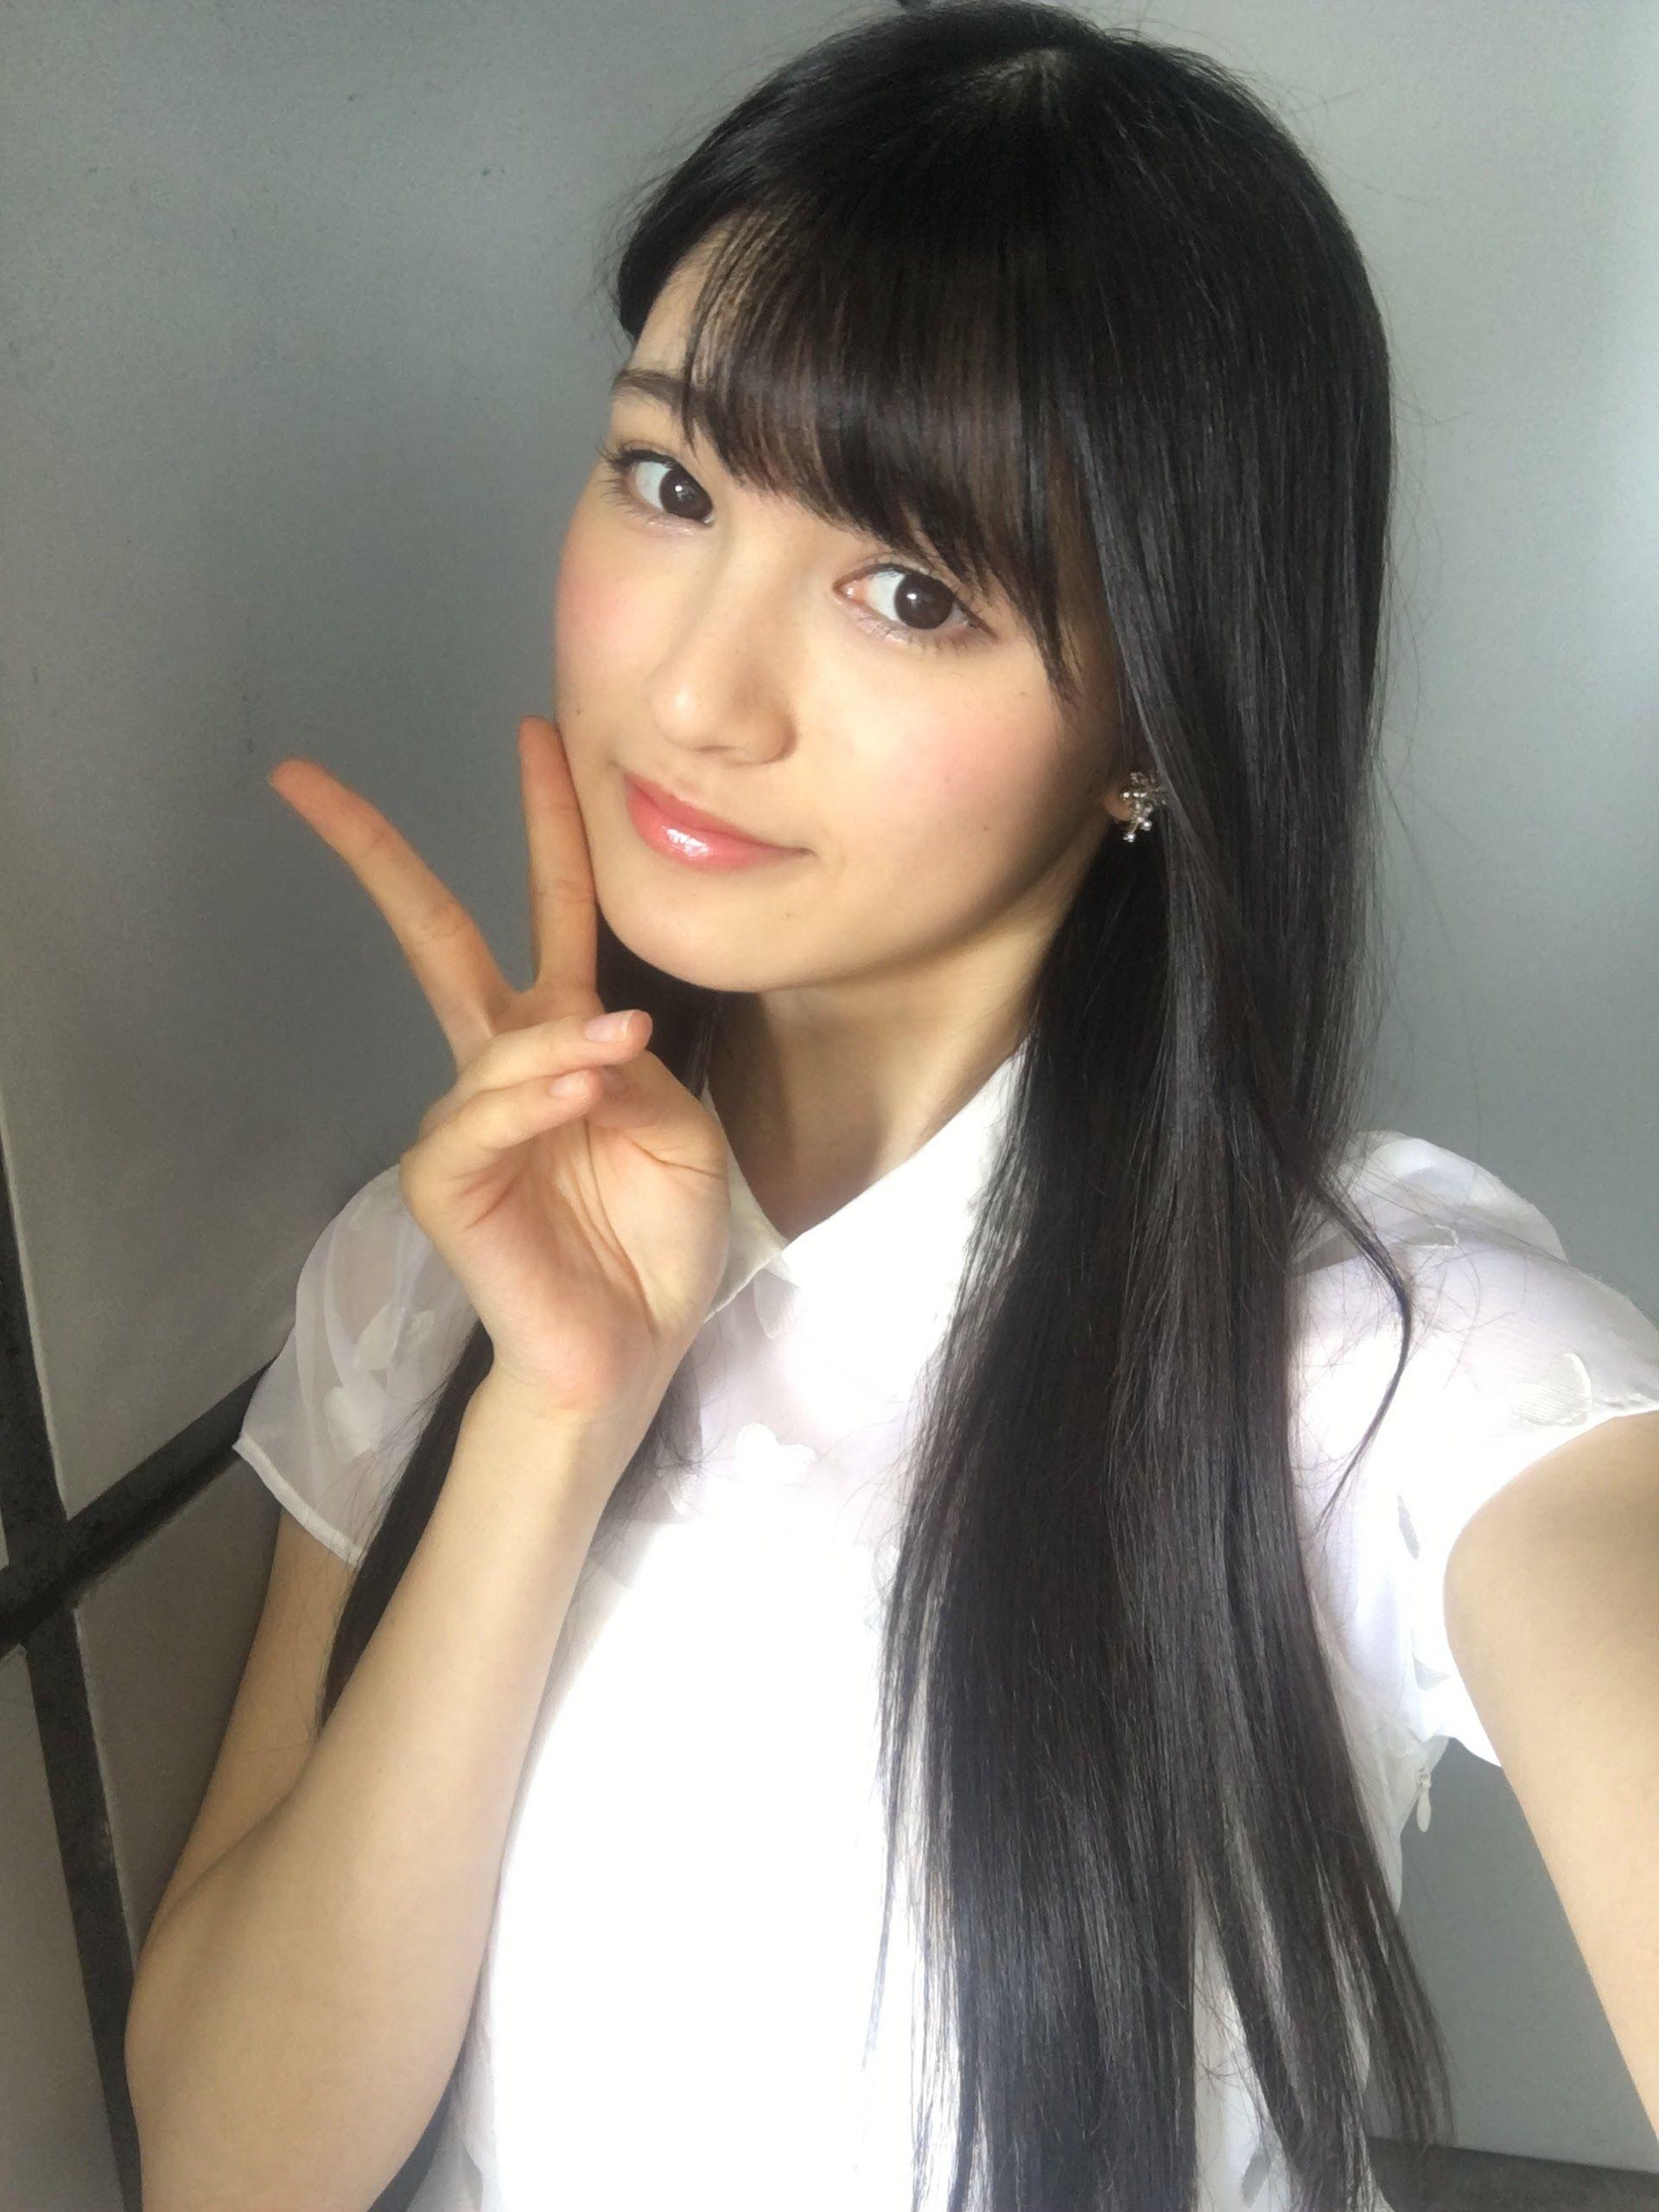 Yui Kojina 神志那結衣 Japanese Girls 日本人女性